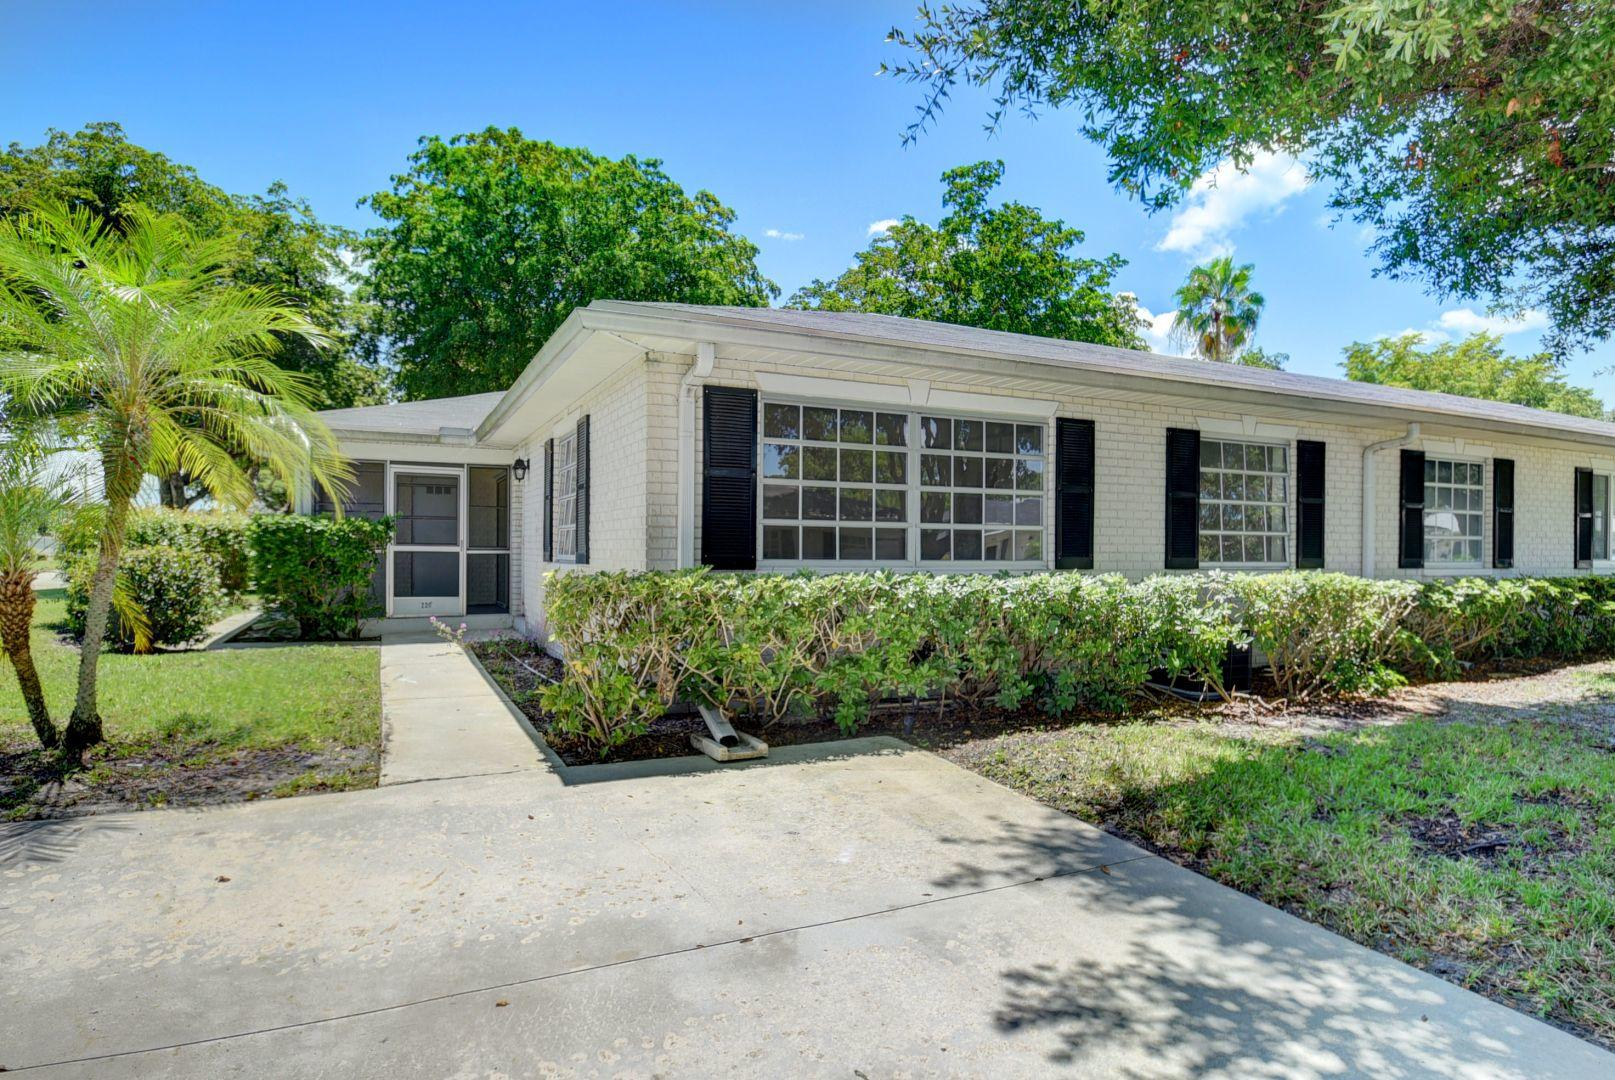 Photo of home for sale at 10074 41st Terrace S, Boynton Beach FL